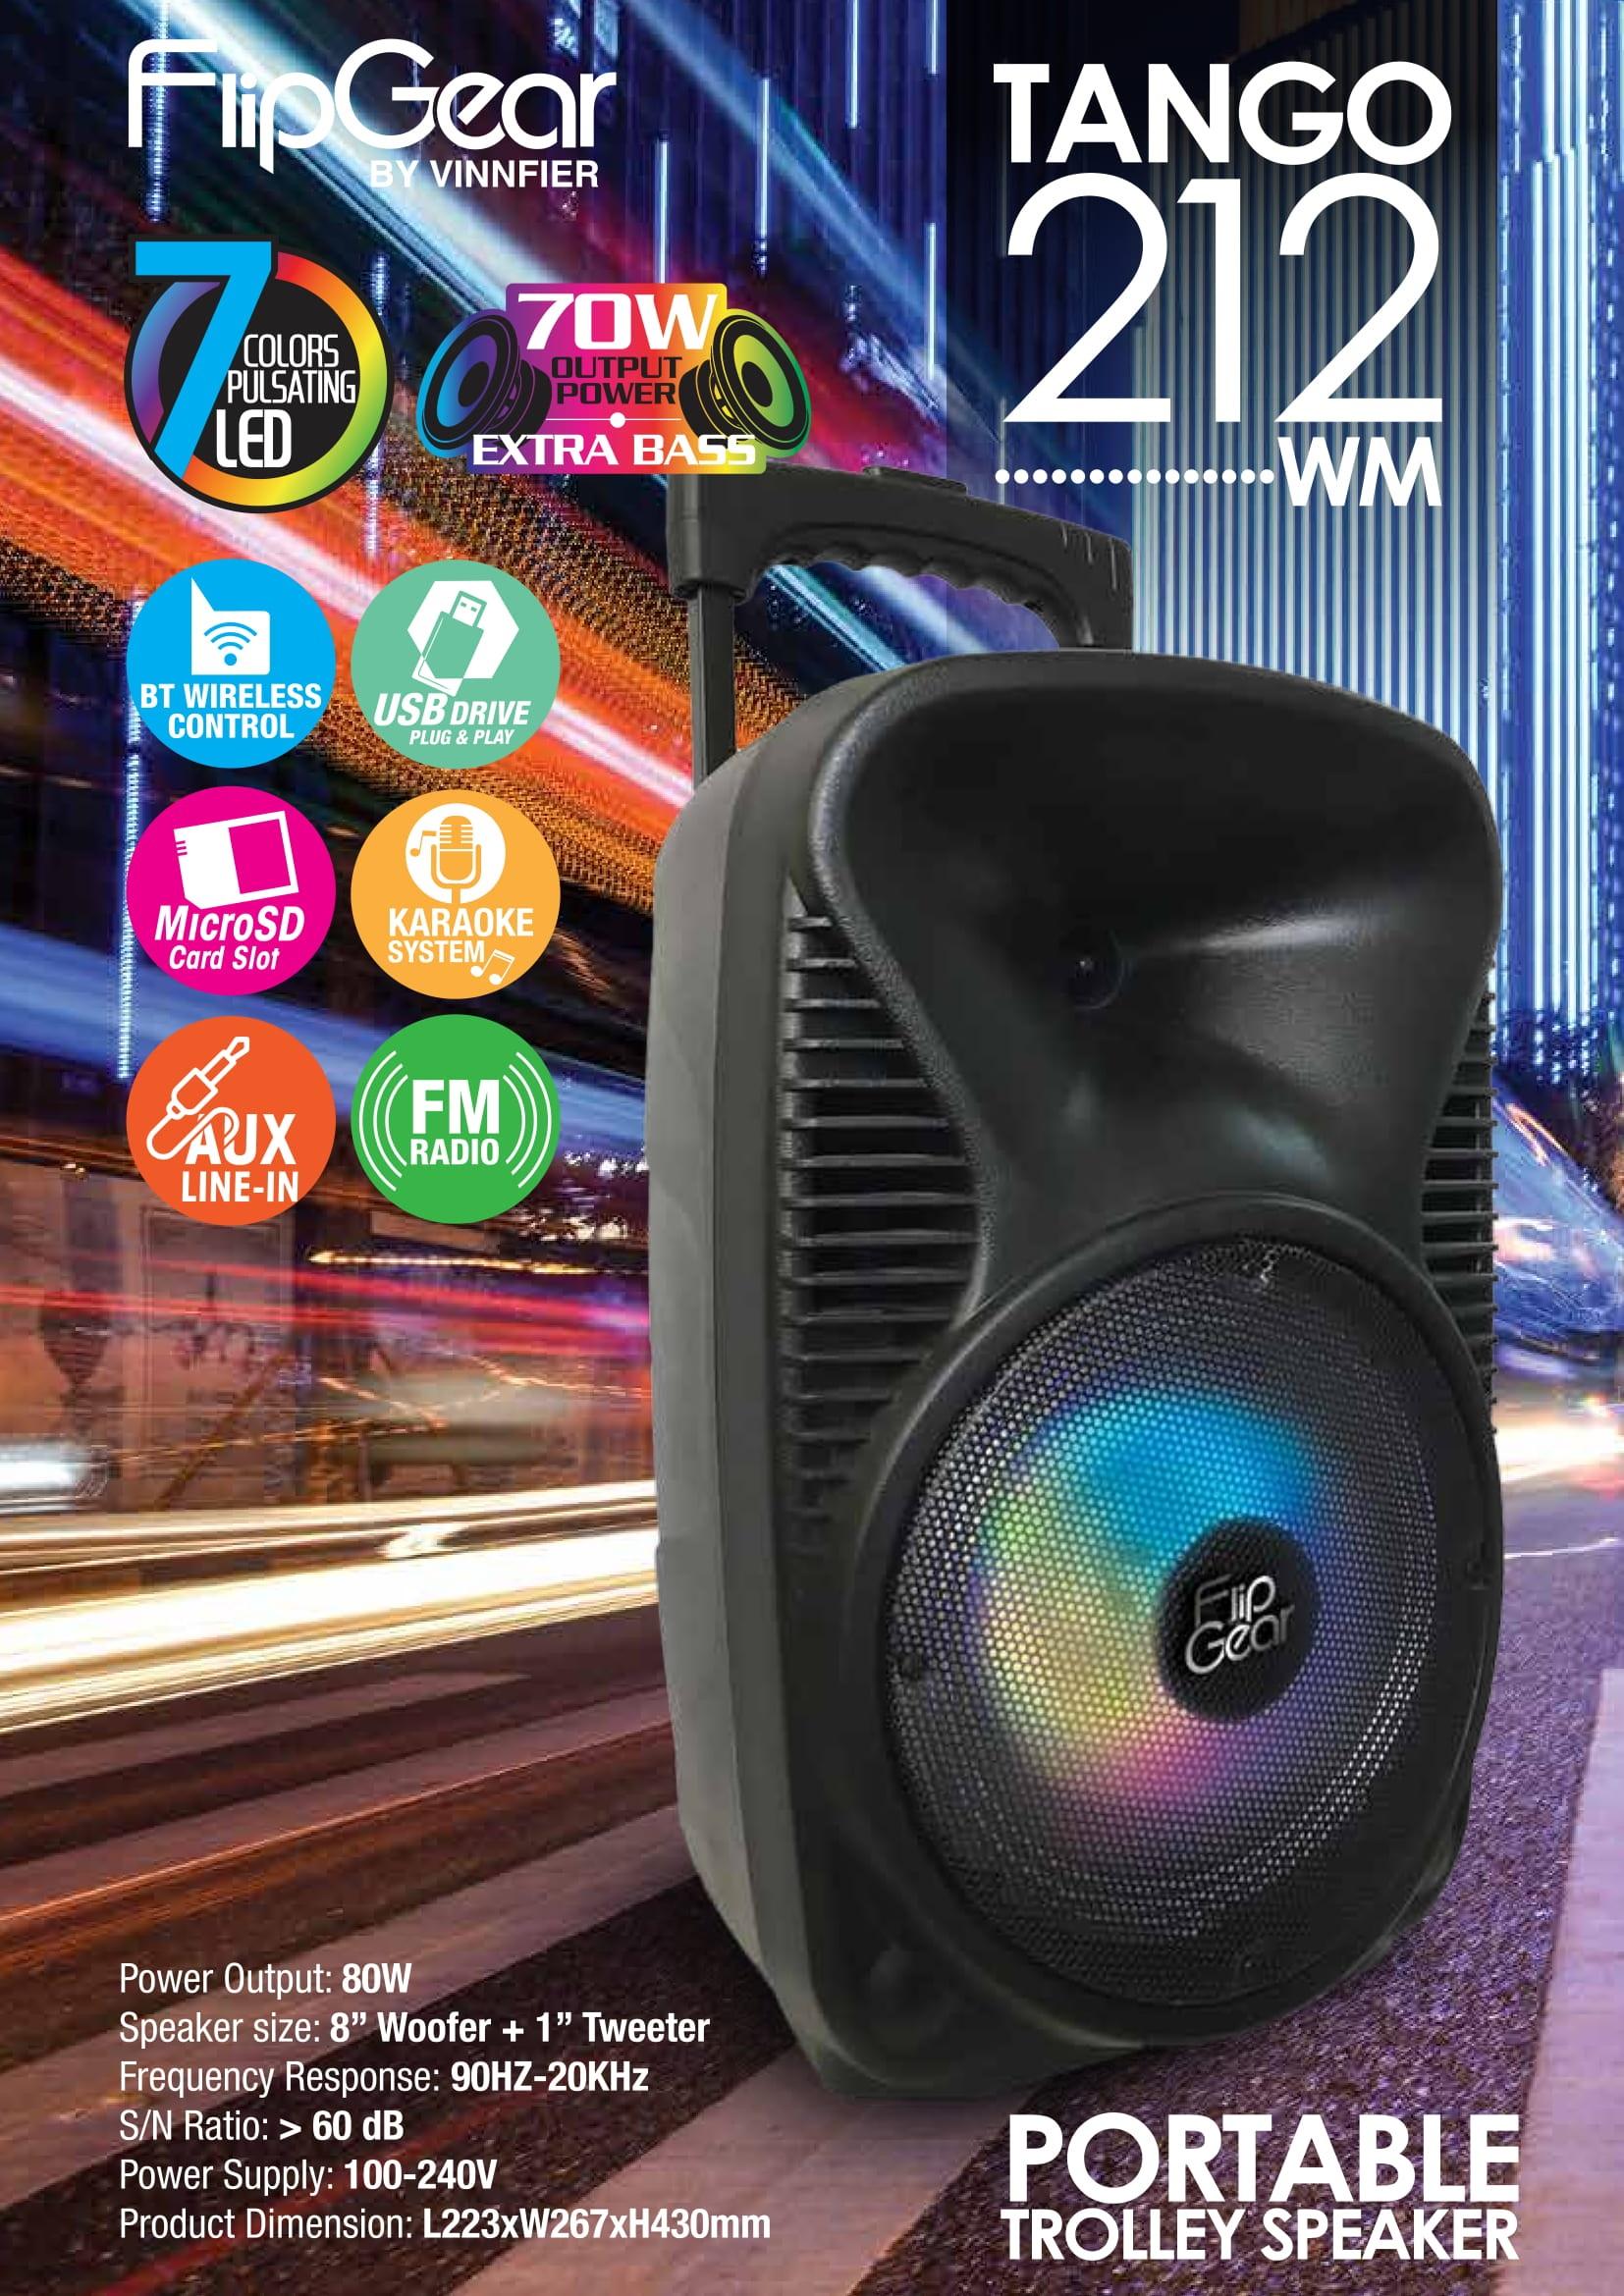 Vinnfier-Tango-212-Bluetooth-Speaker